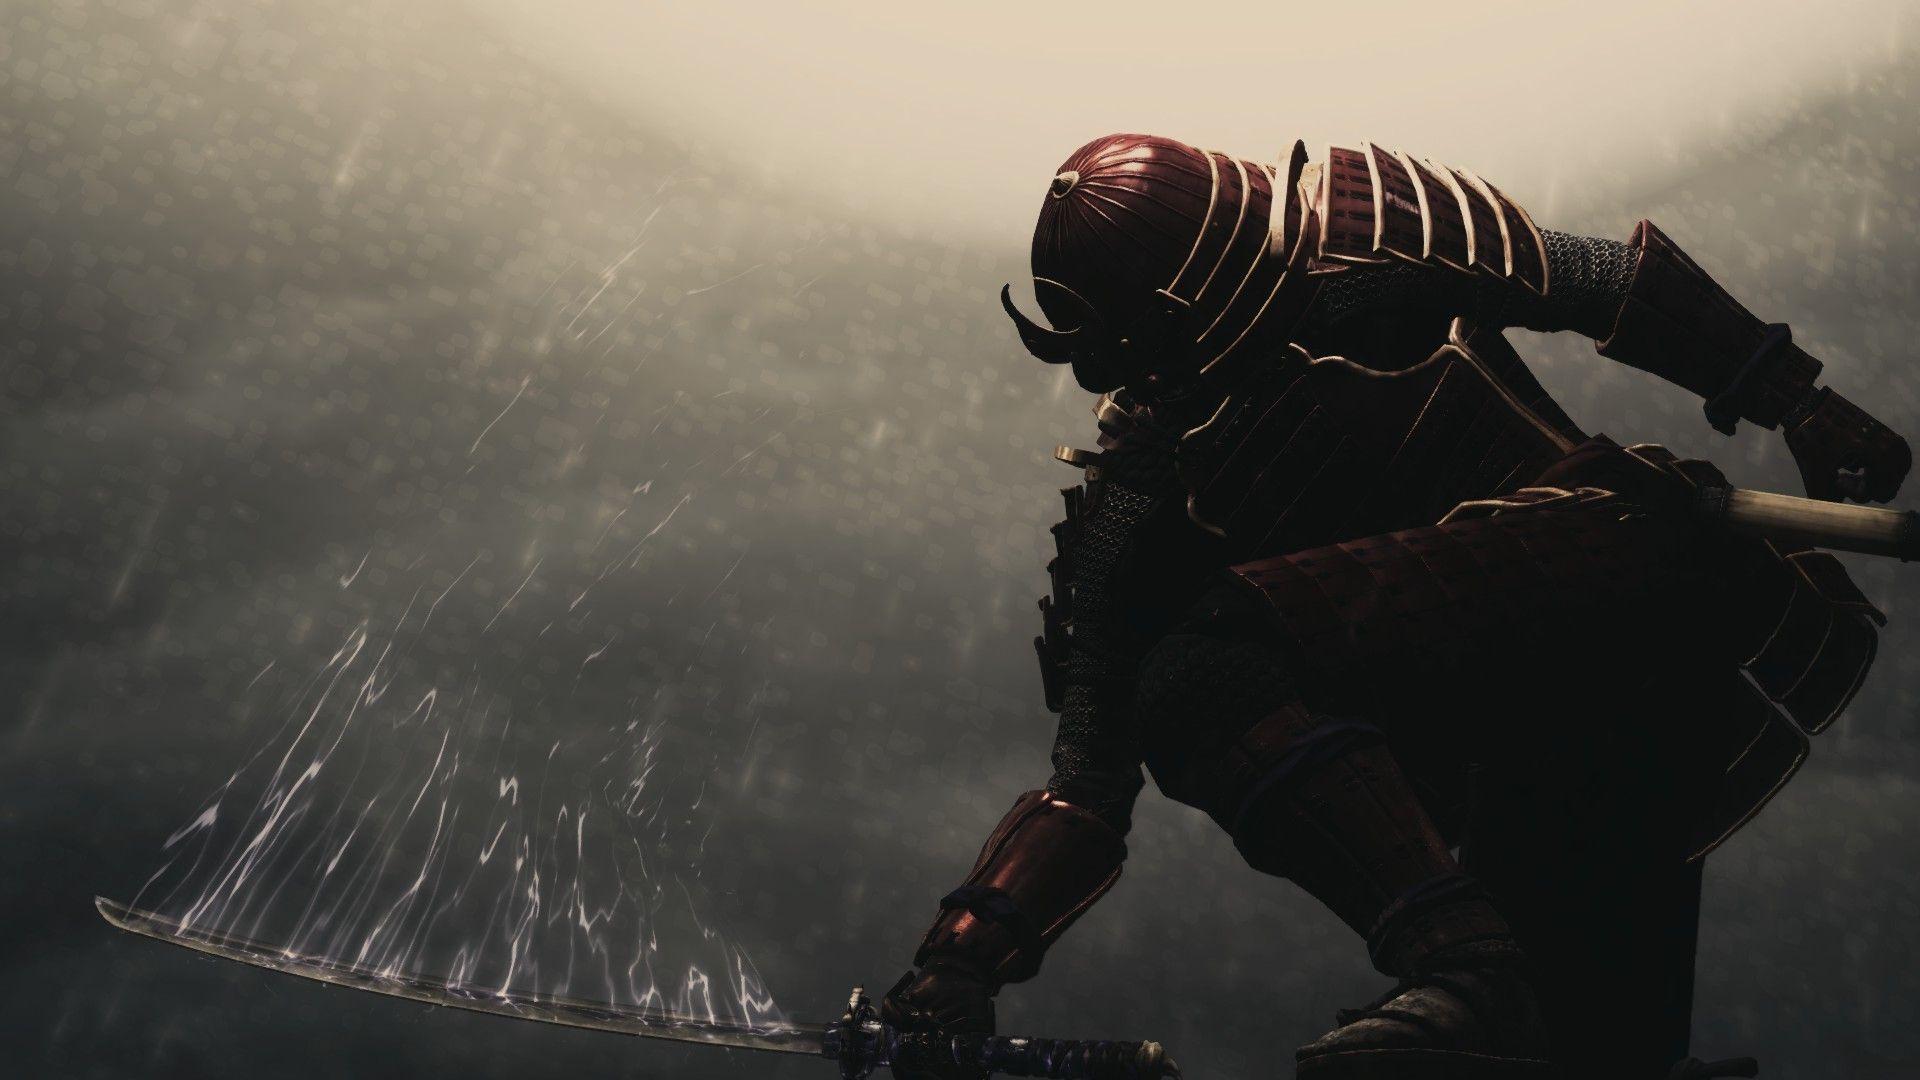 Download wallpaper samurai, sword, armor, background